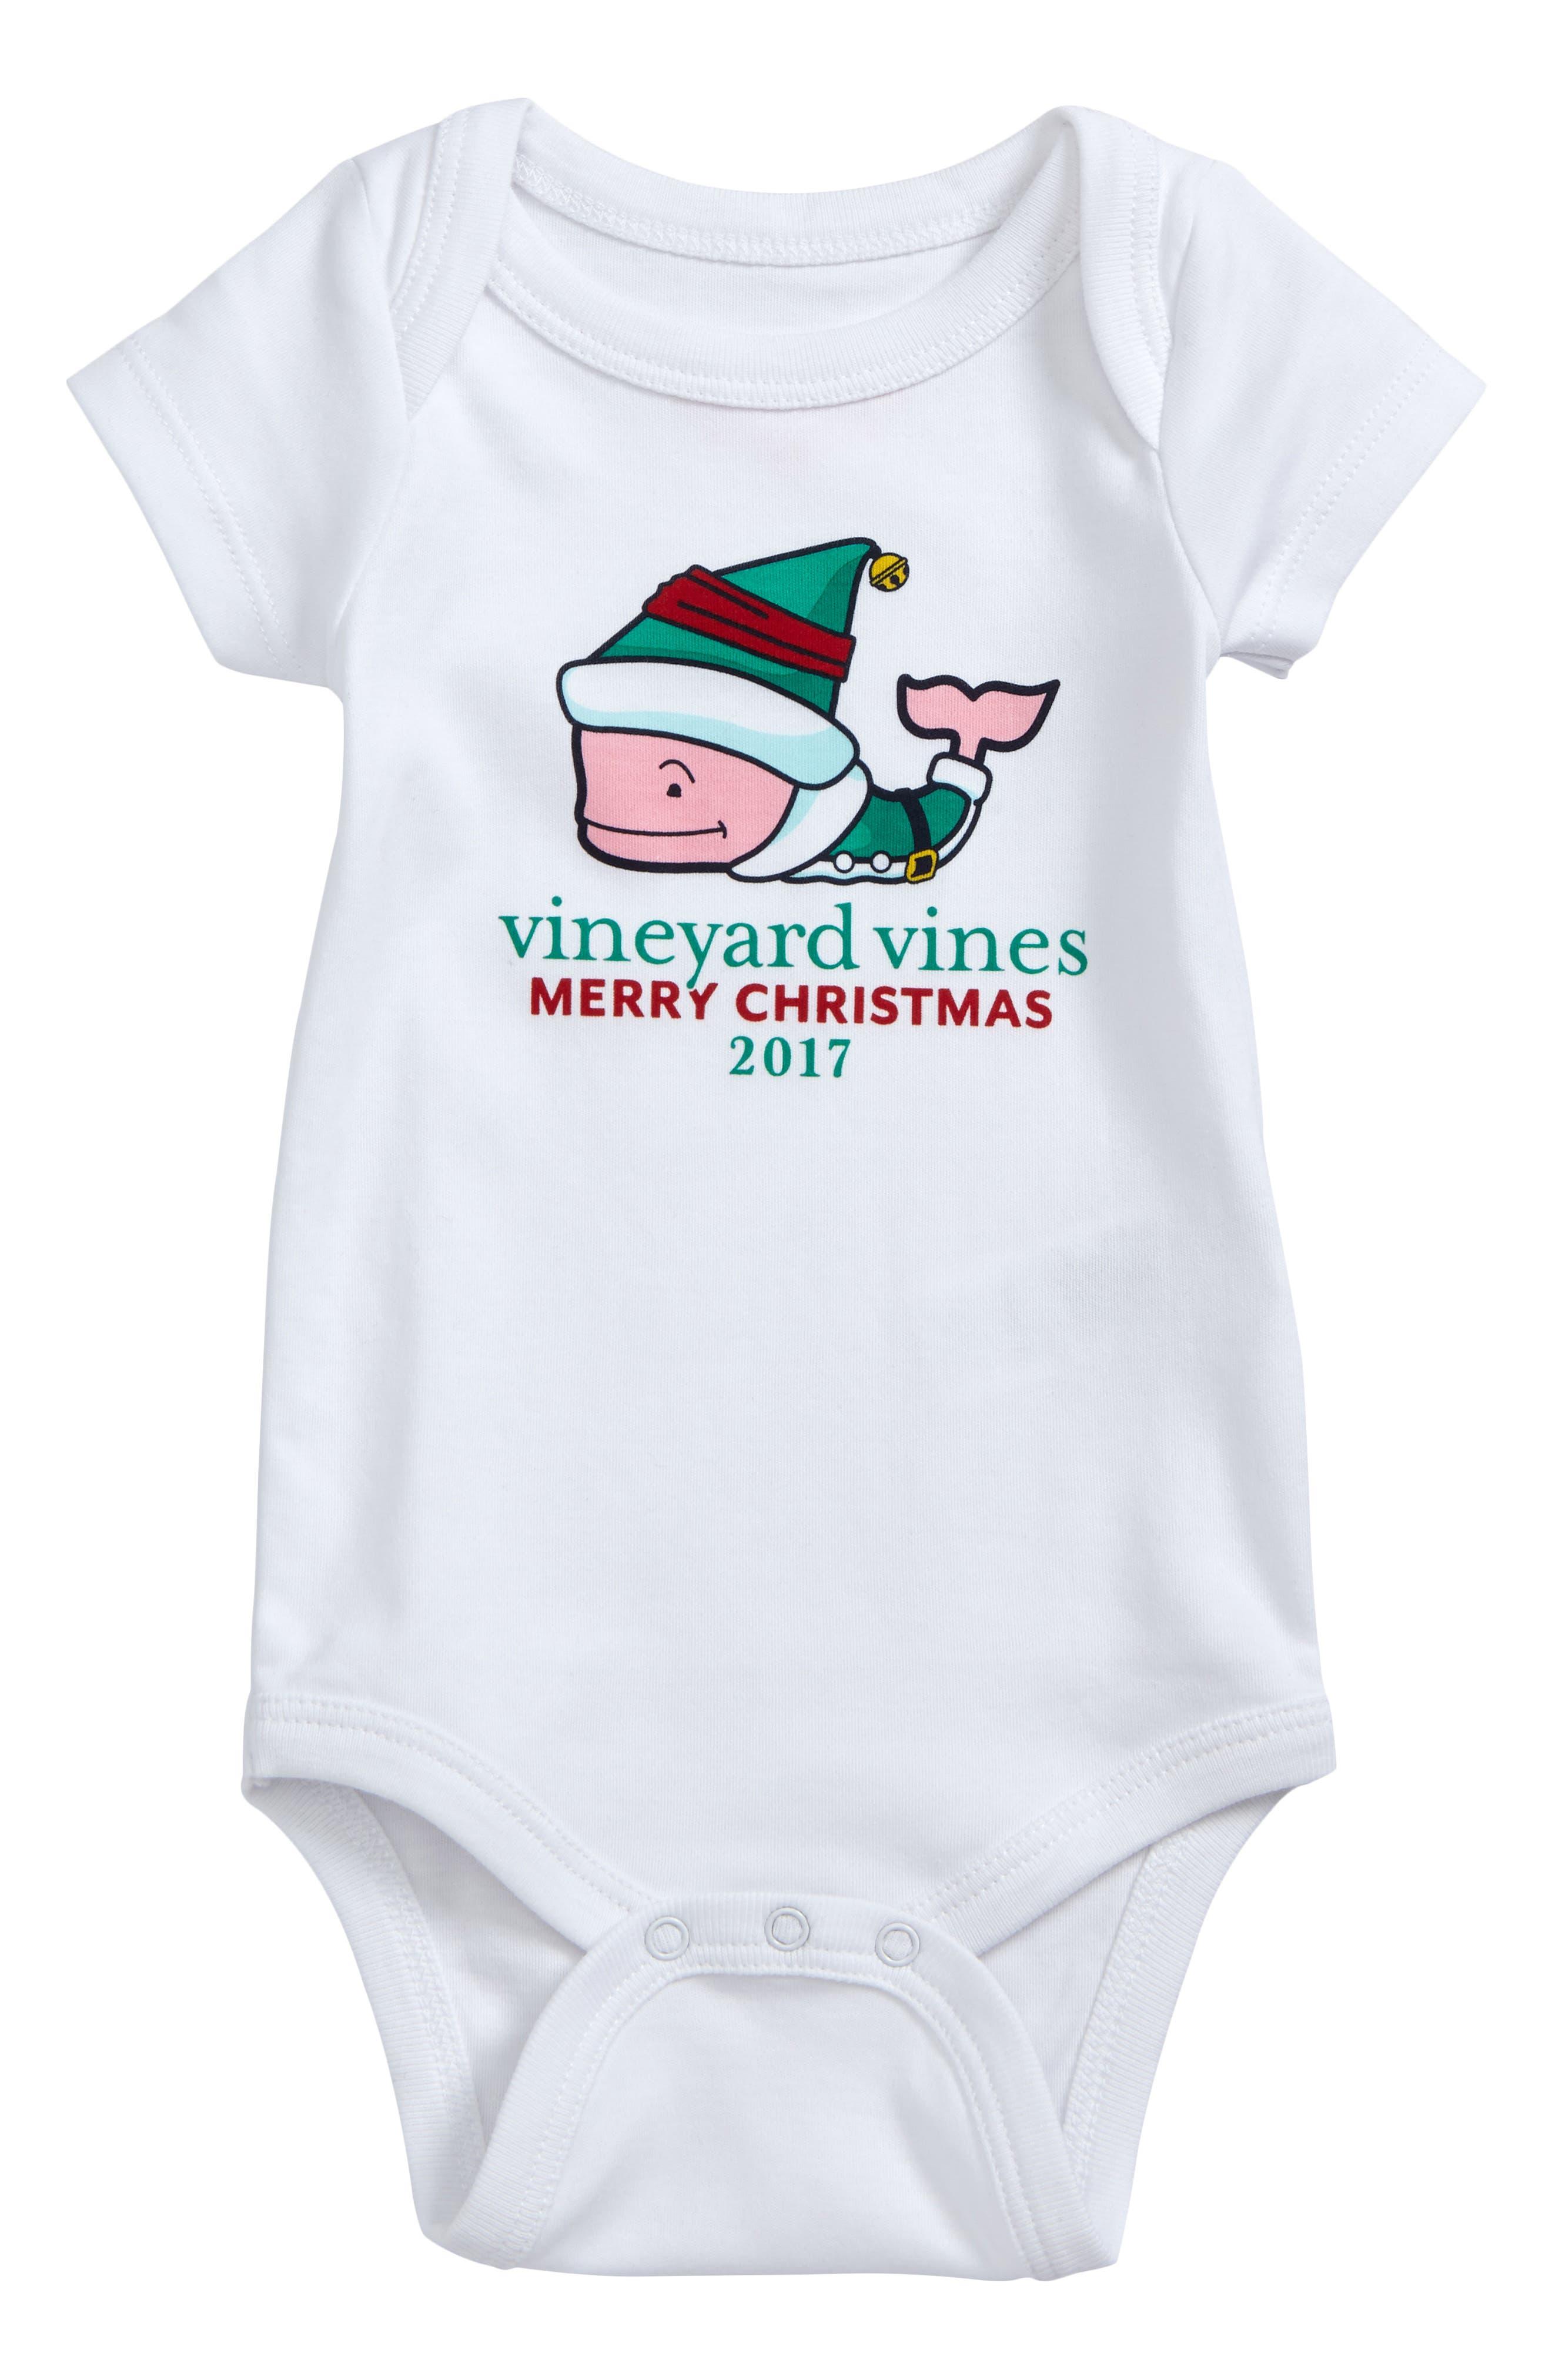 Main Image - vineyard vines Elf Whale Merry Christmas 2017 Bodysuit (Baby)